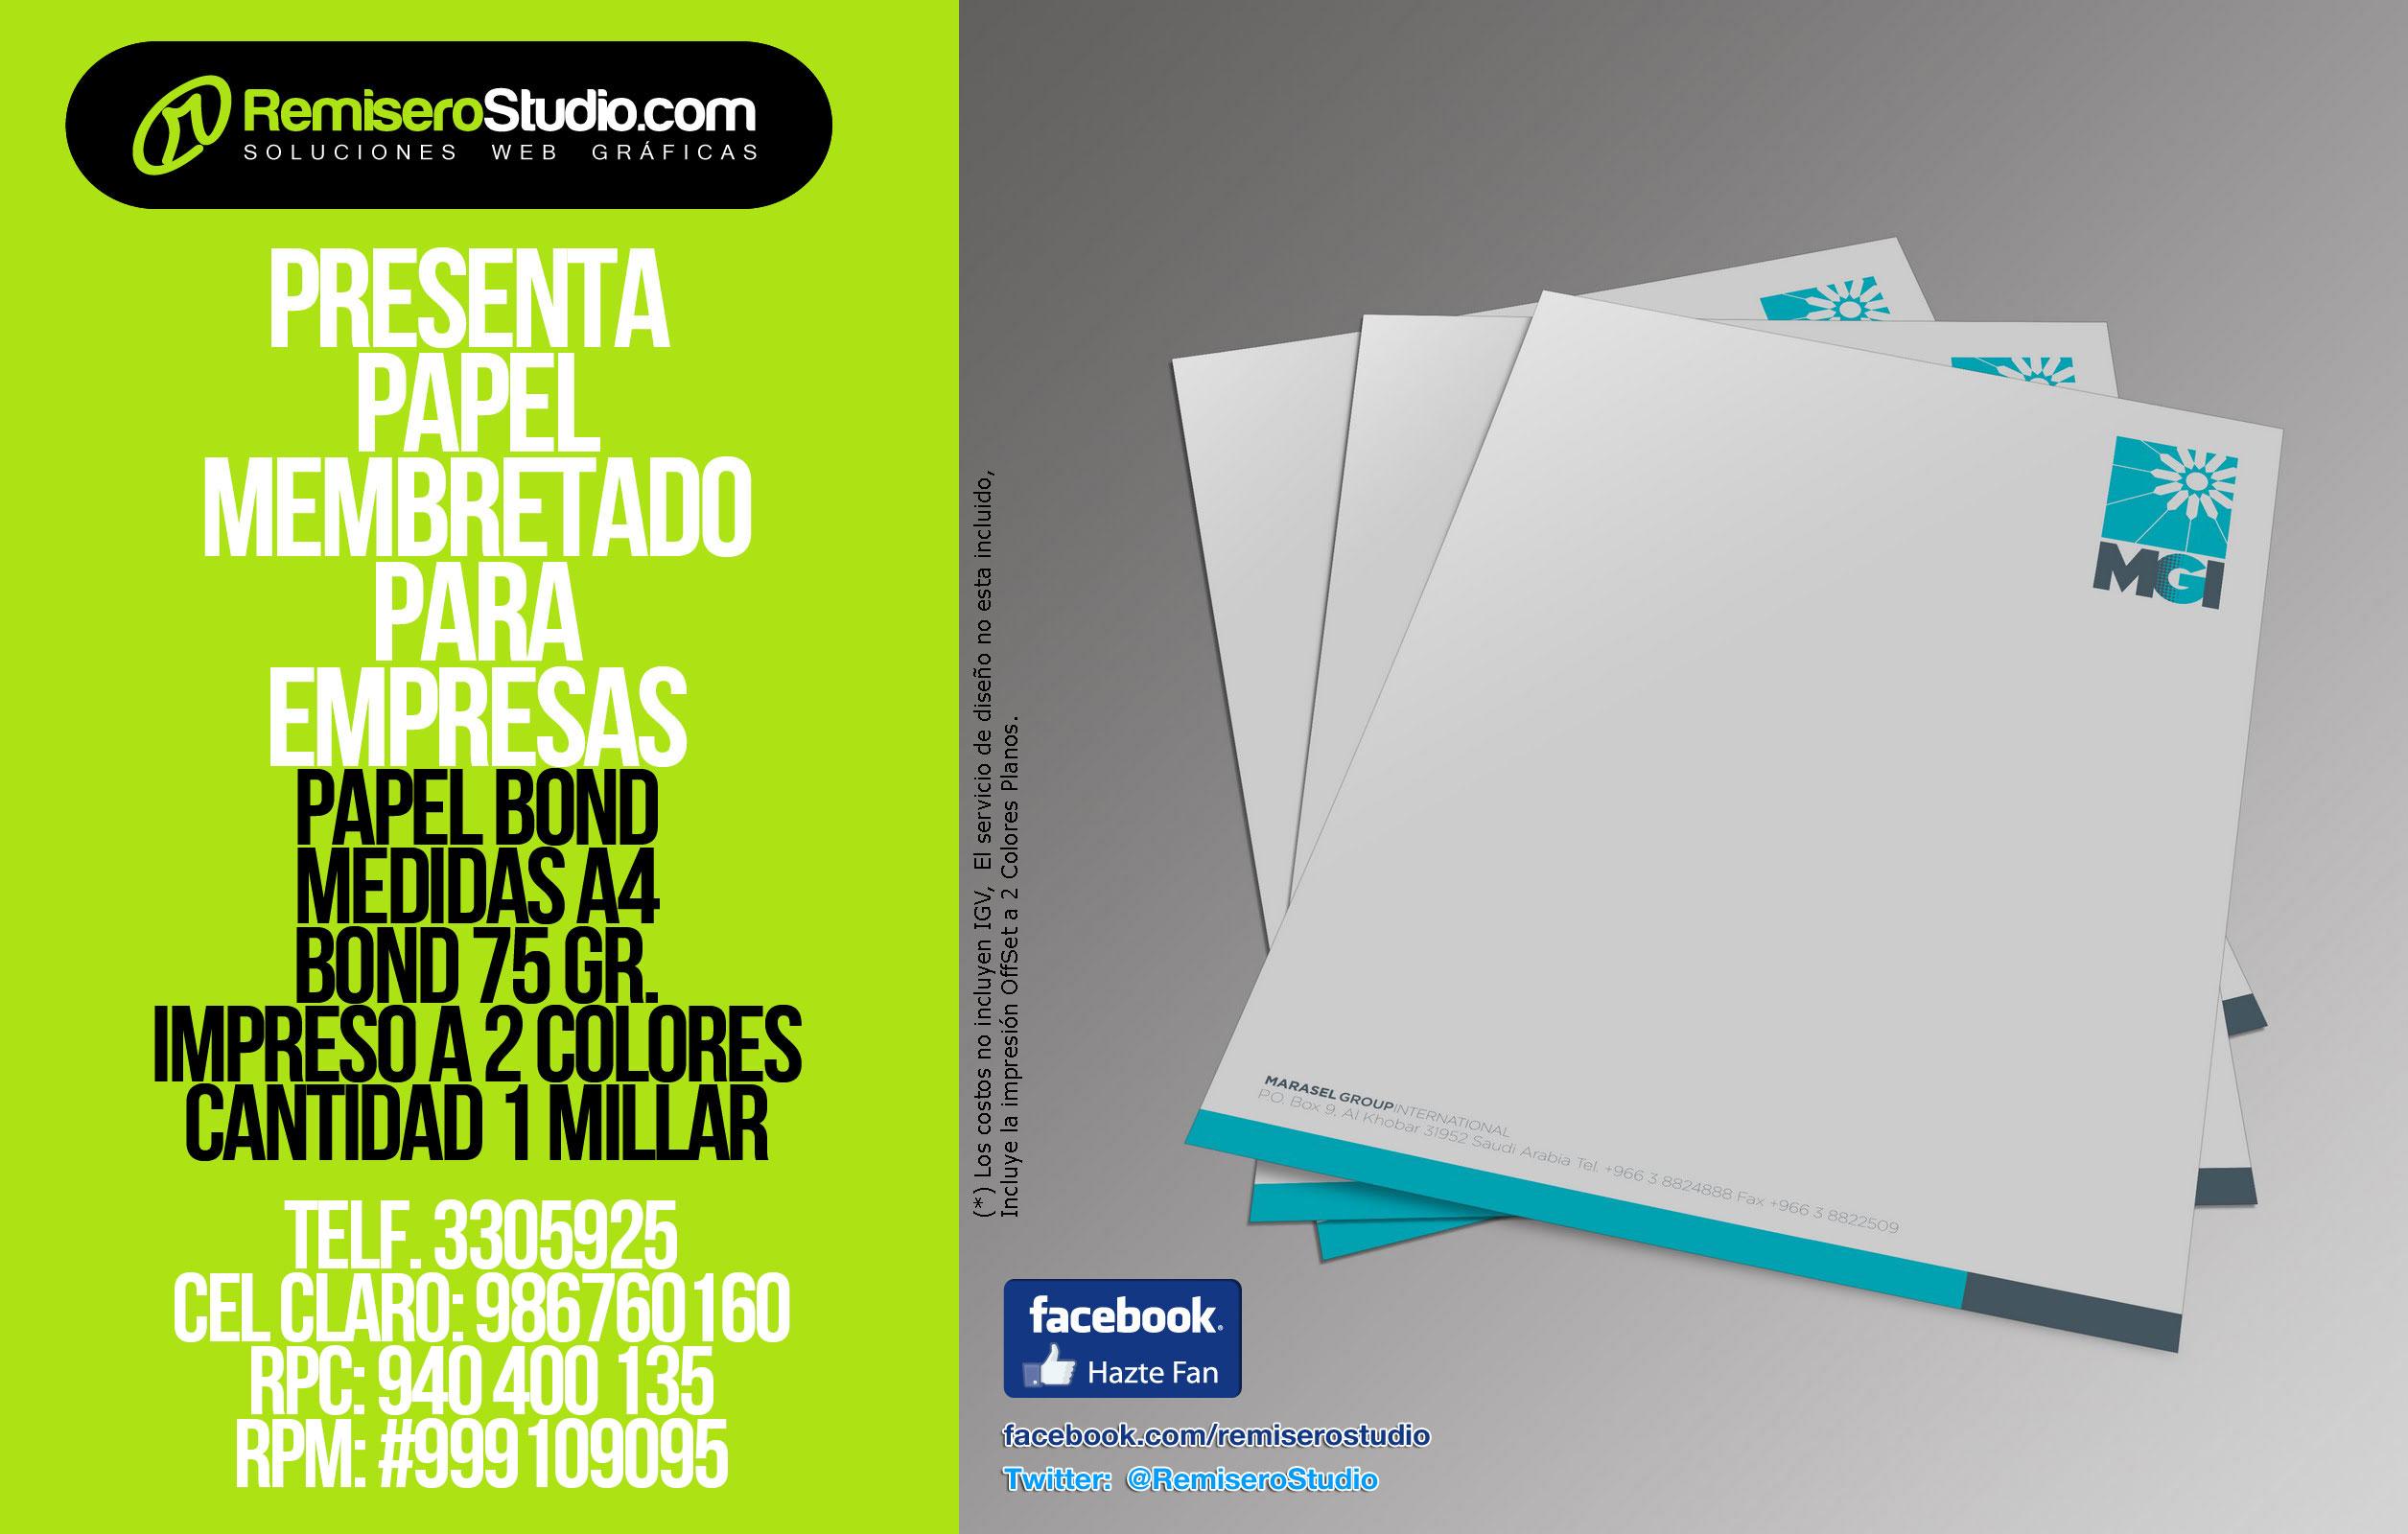 (1000) Millar de Papel Membretado A4 Bond 75 gr. 2 Colores